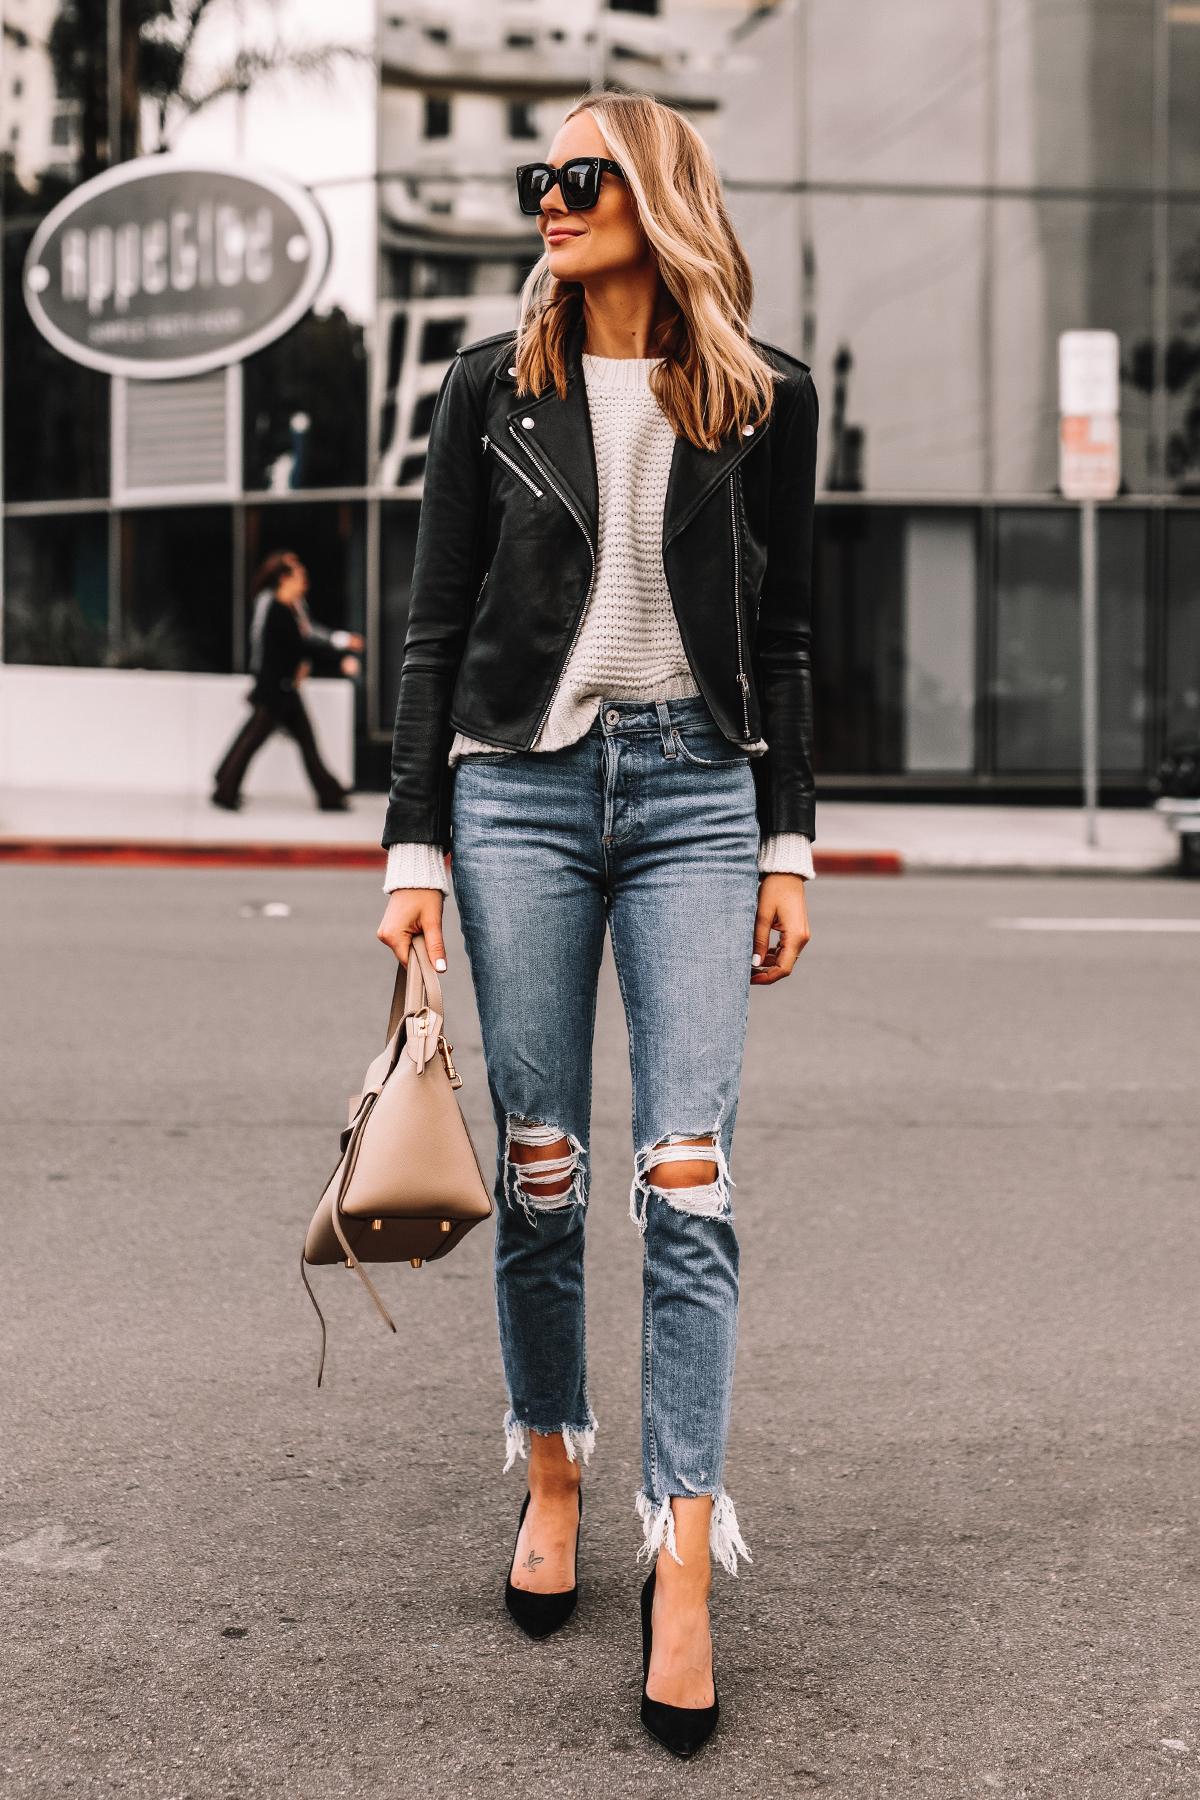 Fashion Jackson Wearing Black Leather Jacket White Sweater Ripped Jeans Black Pumps Celine Mini Belt Bag Taupe 2